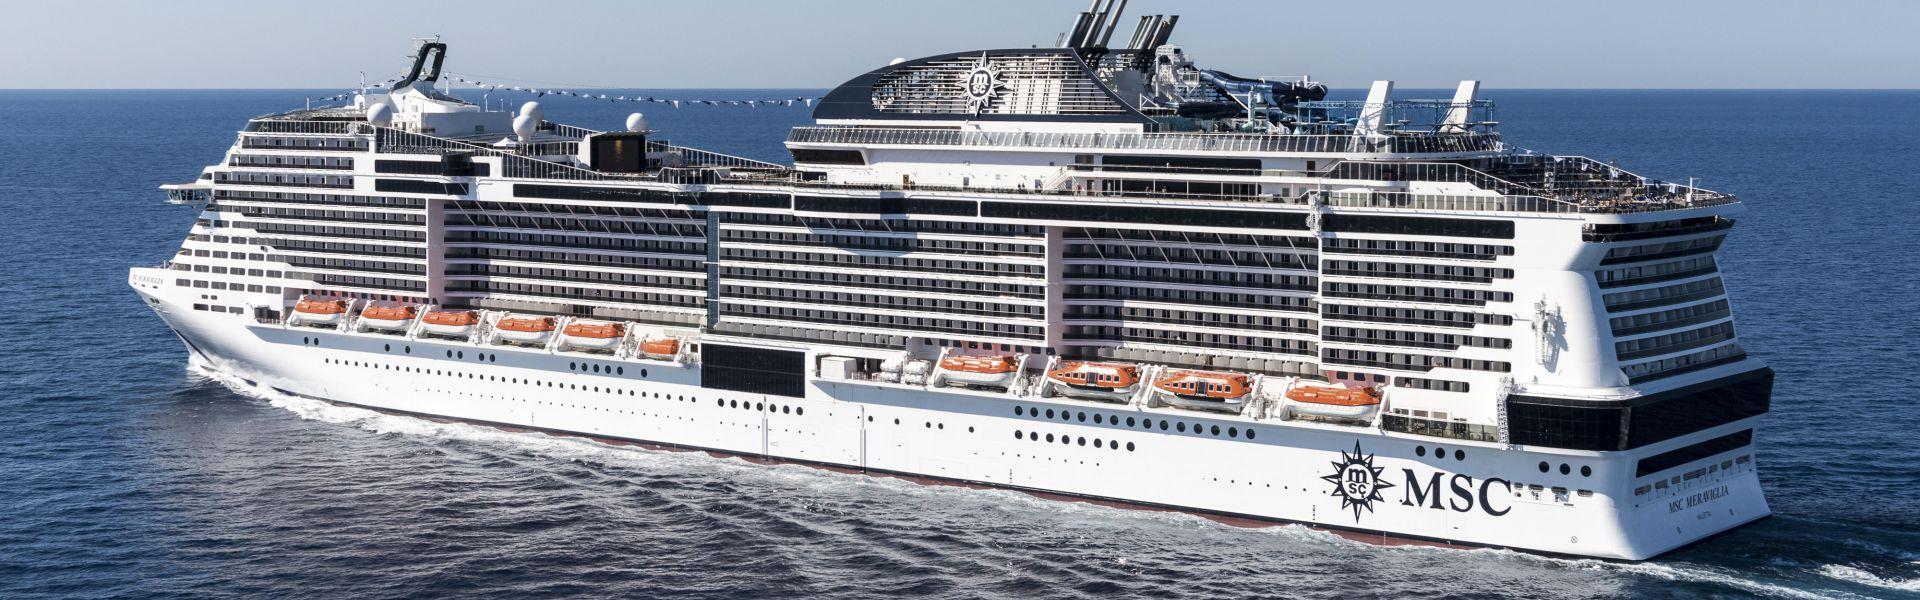 Croaziera 2018 - Coasta si Insulele Britanice (Hamburg) - MSC Cruises - MSC Meraviglia - 10 nopti